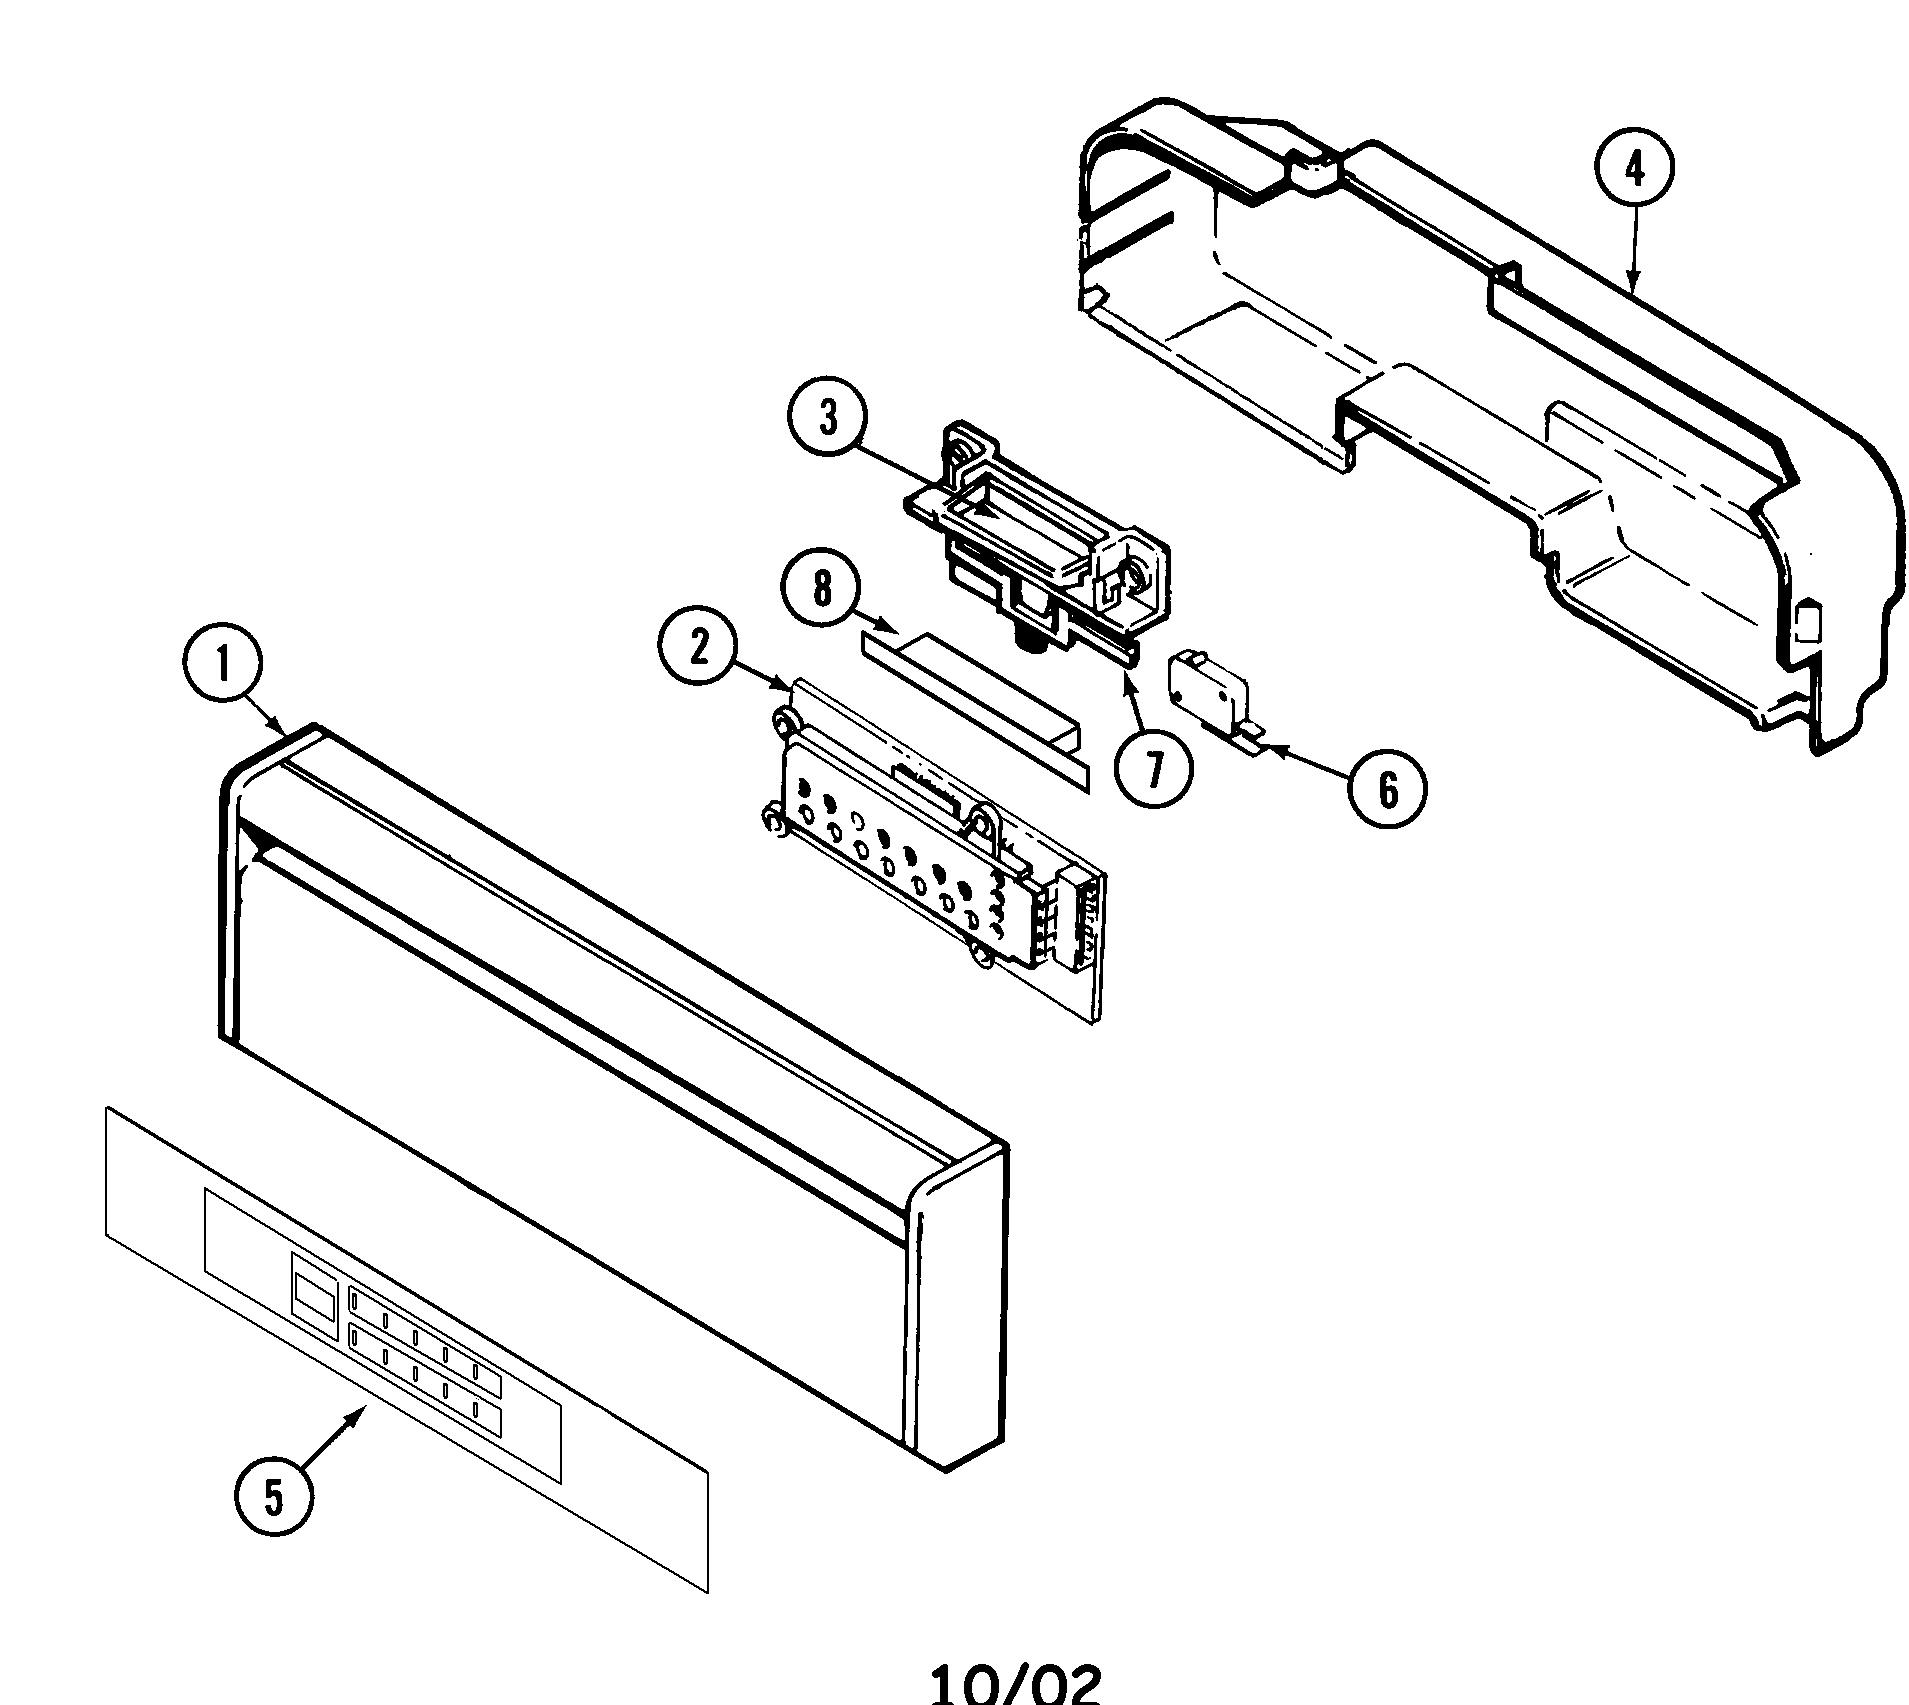 maytag dishwasher wiring diagram inverter for house repair free engine